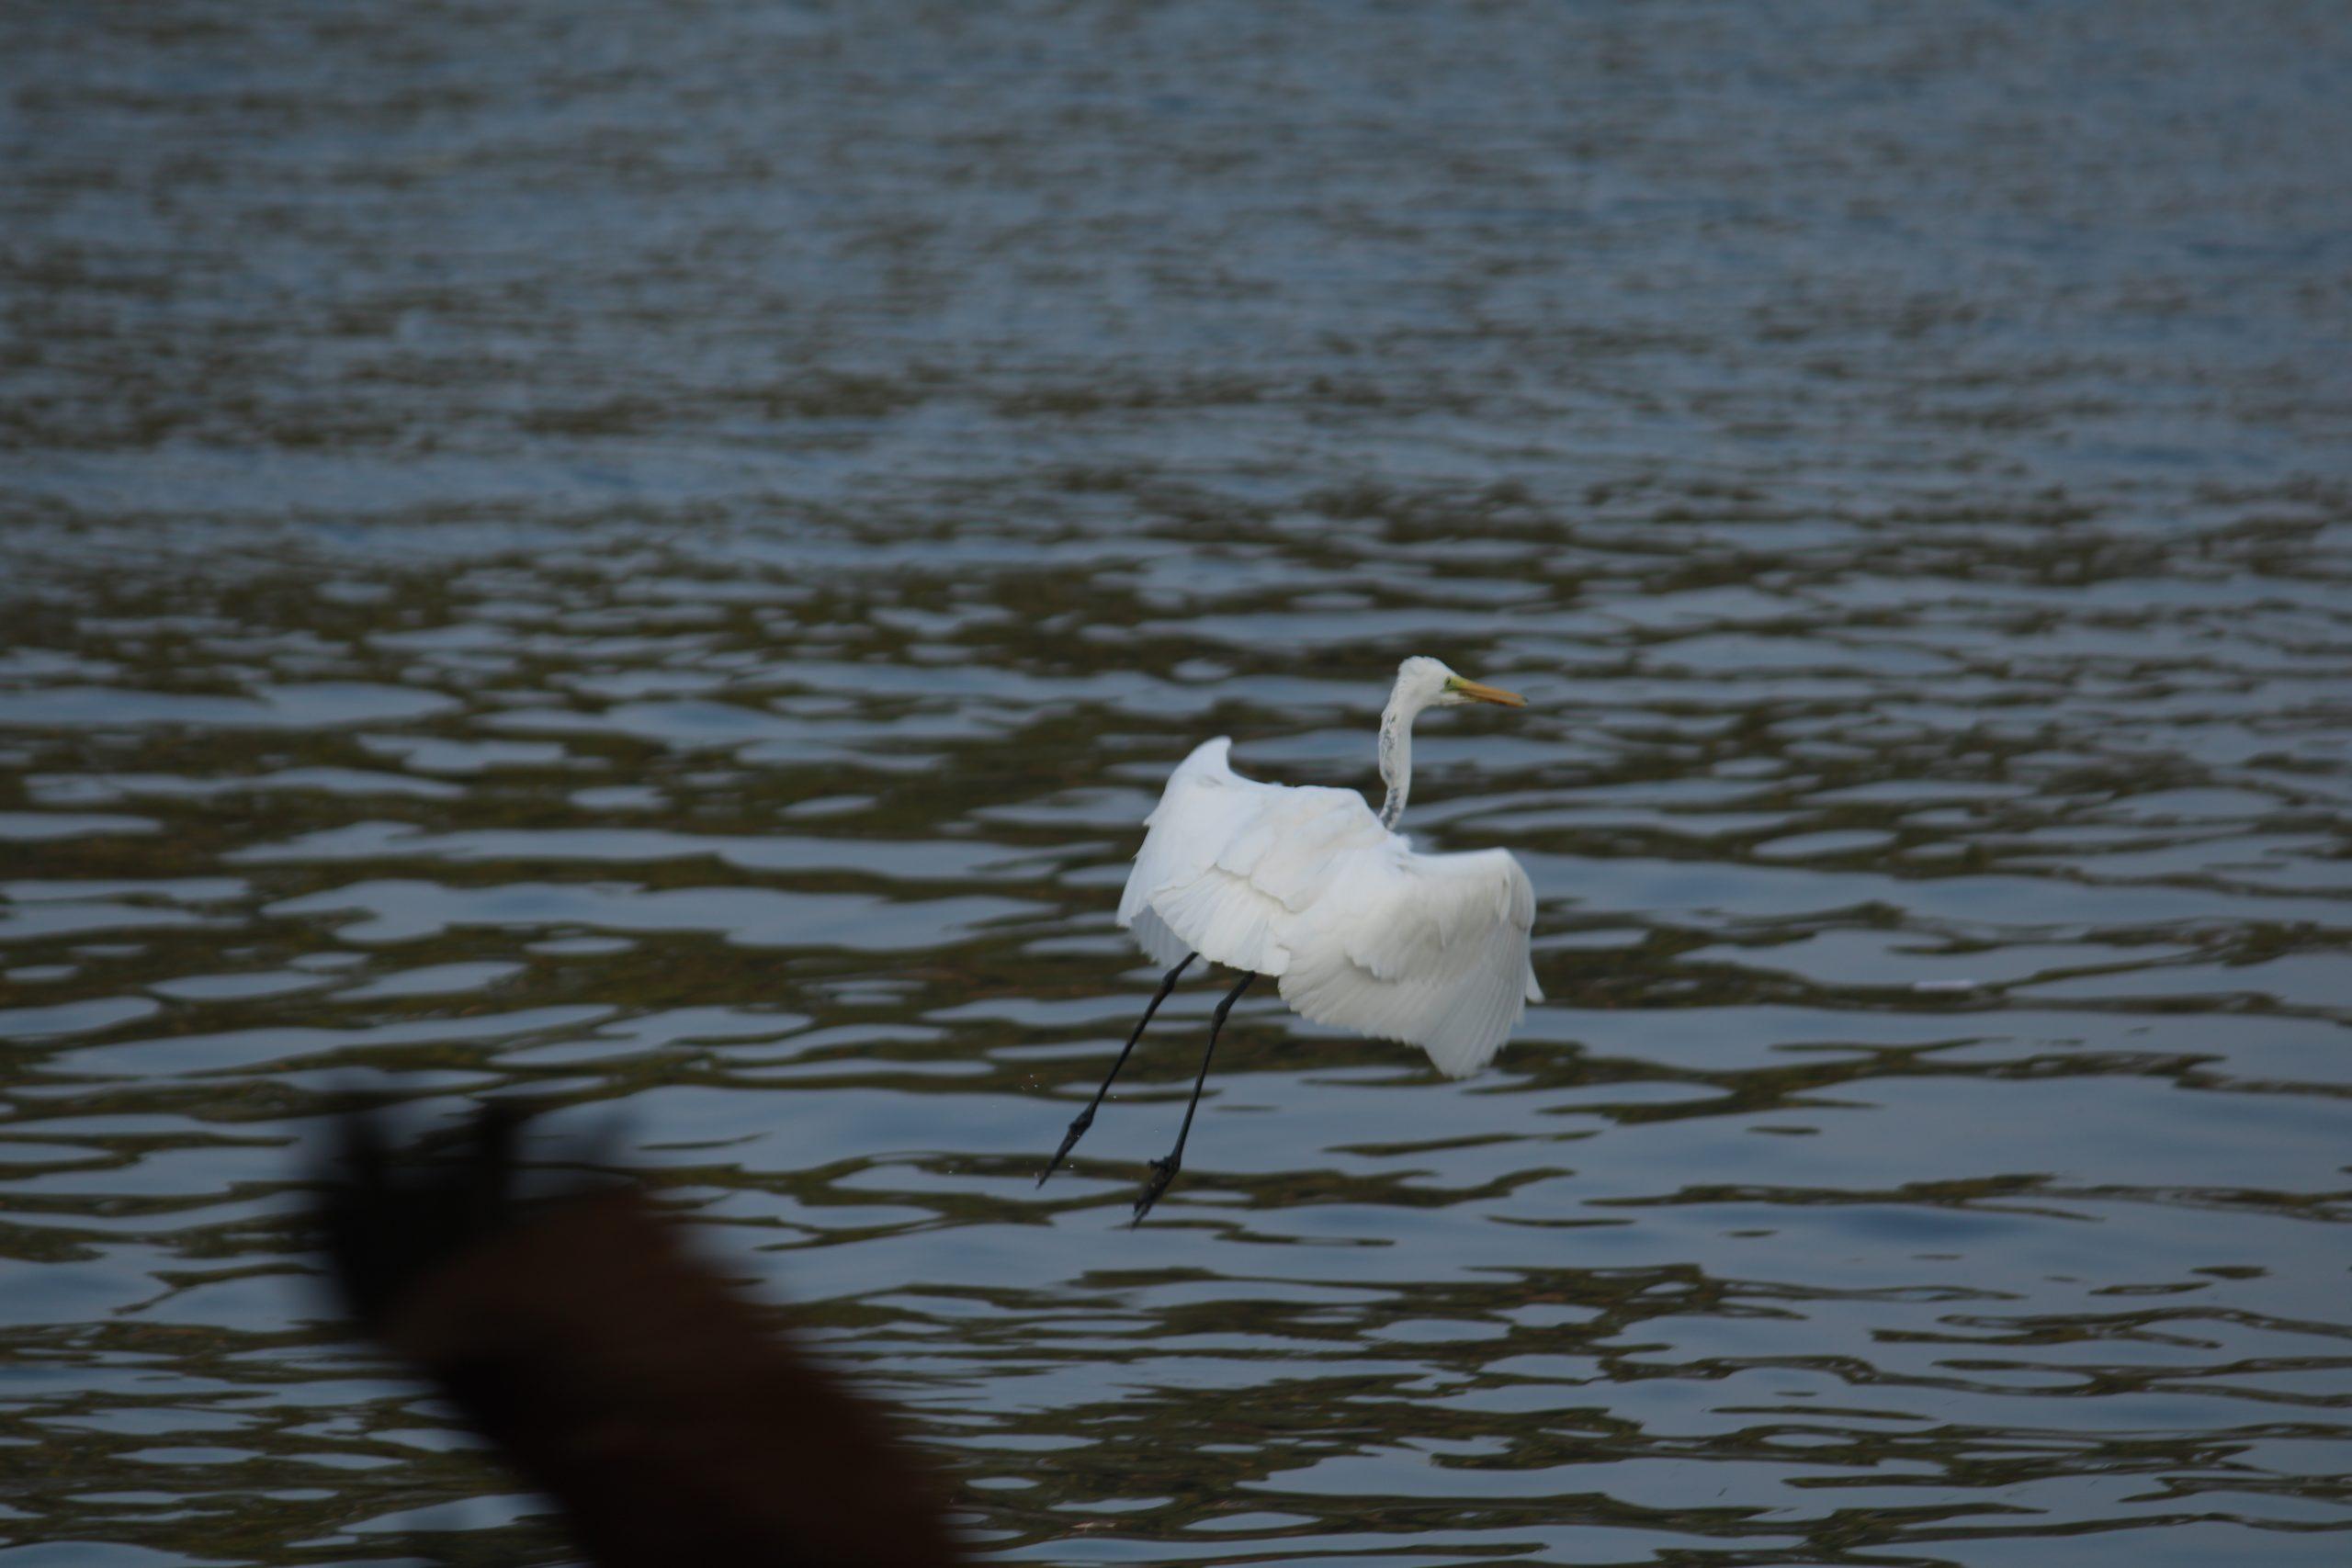 A crane bird flying over the river